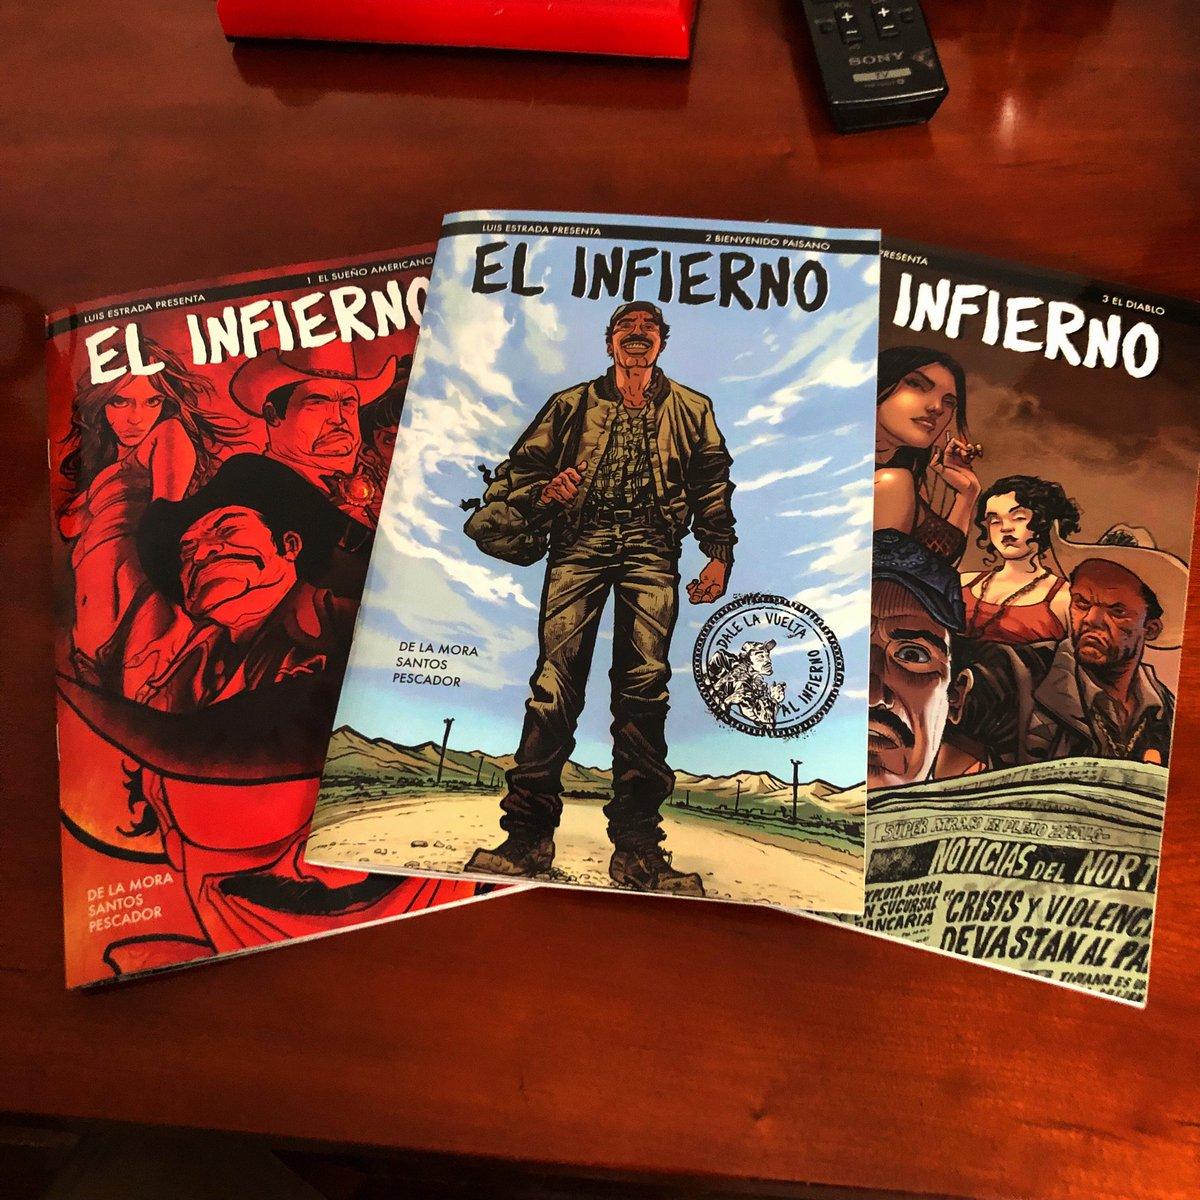 Verdaderas joyas que representan la estupidez de una guerra revanchista de Felipe Calderón. https://t.co/C55lLqLUwE